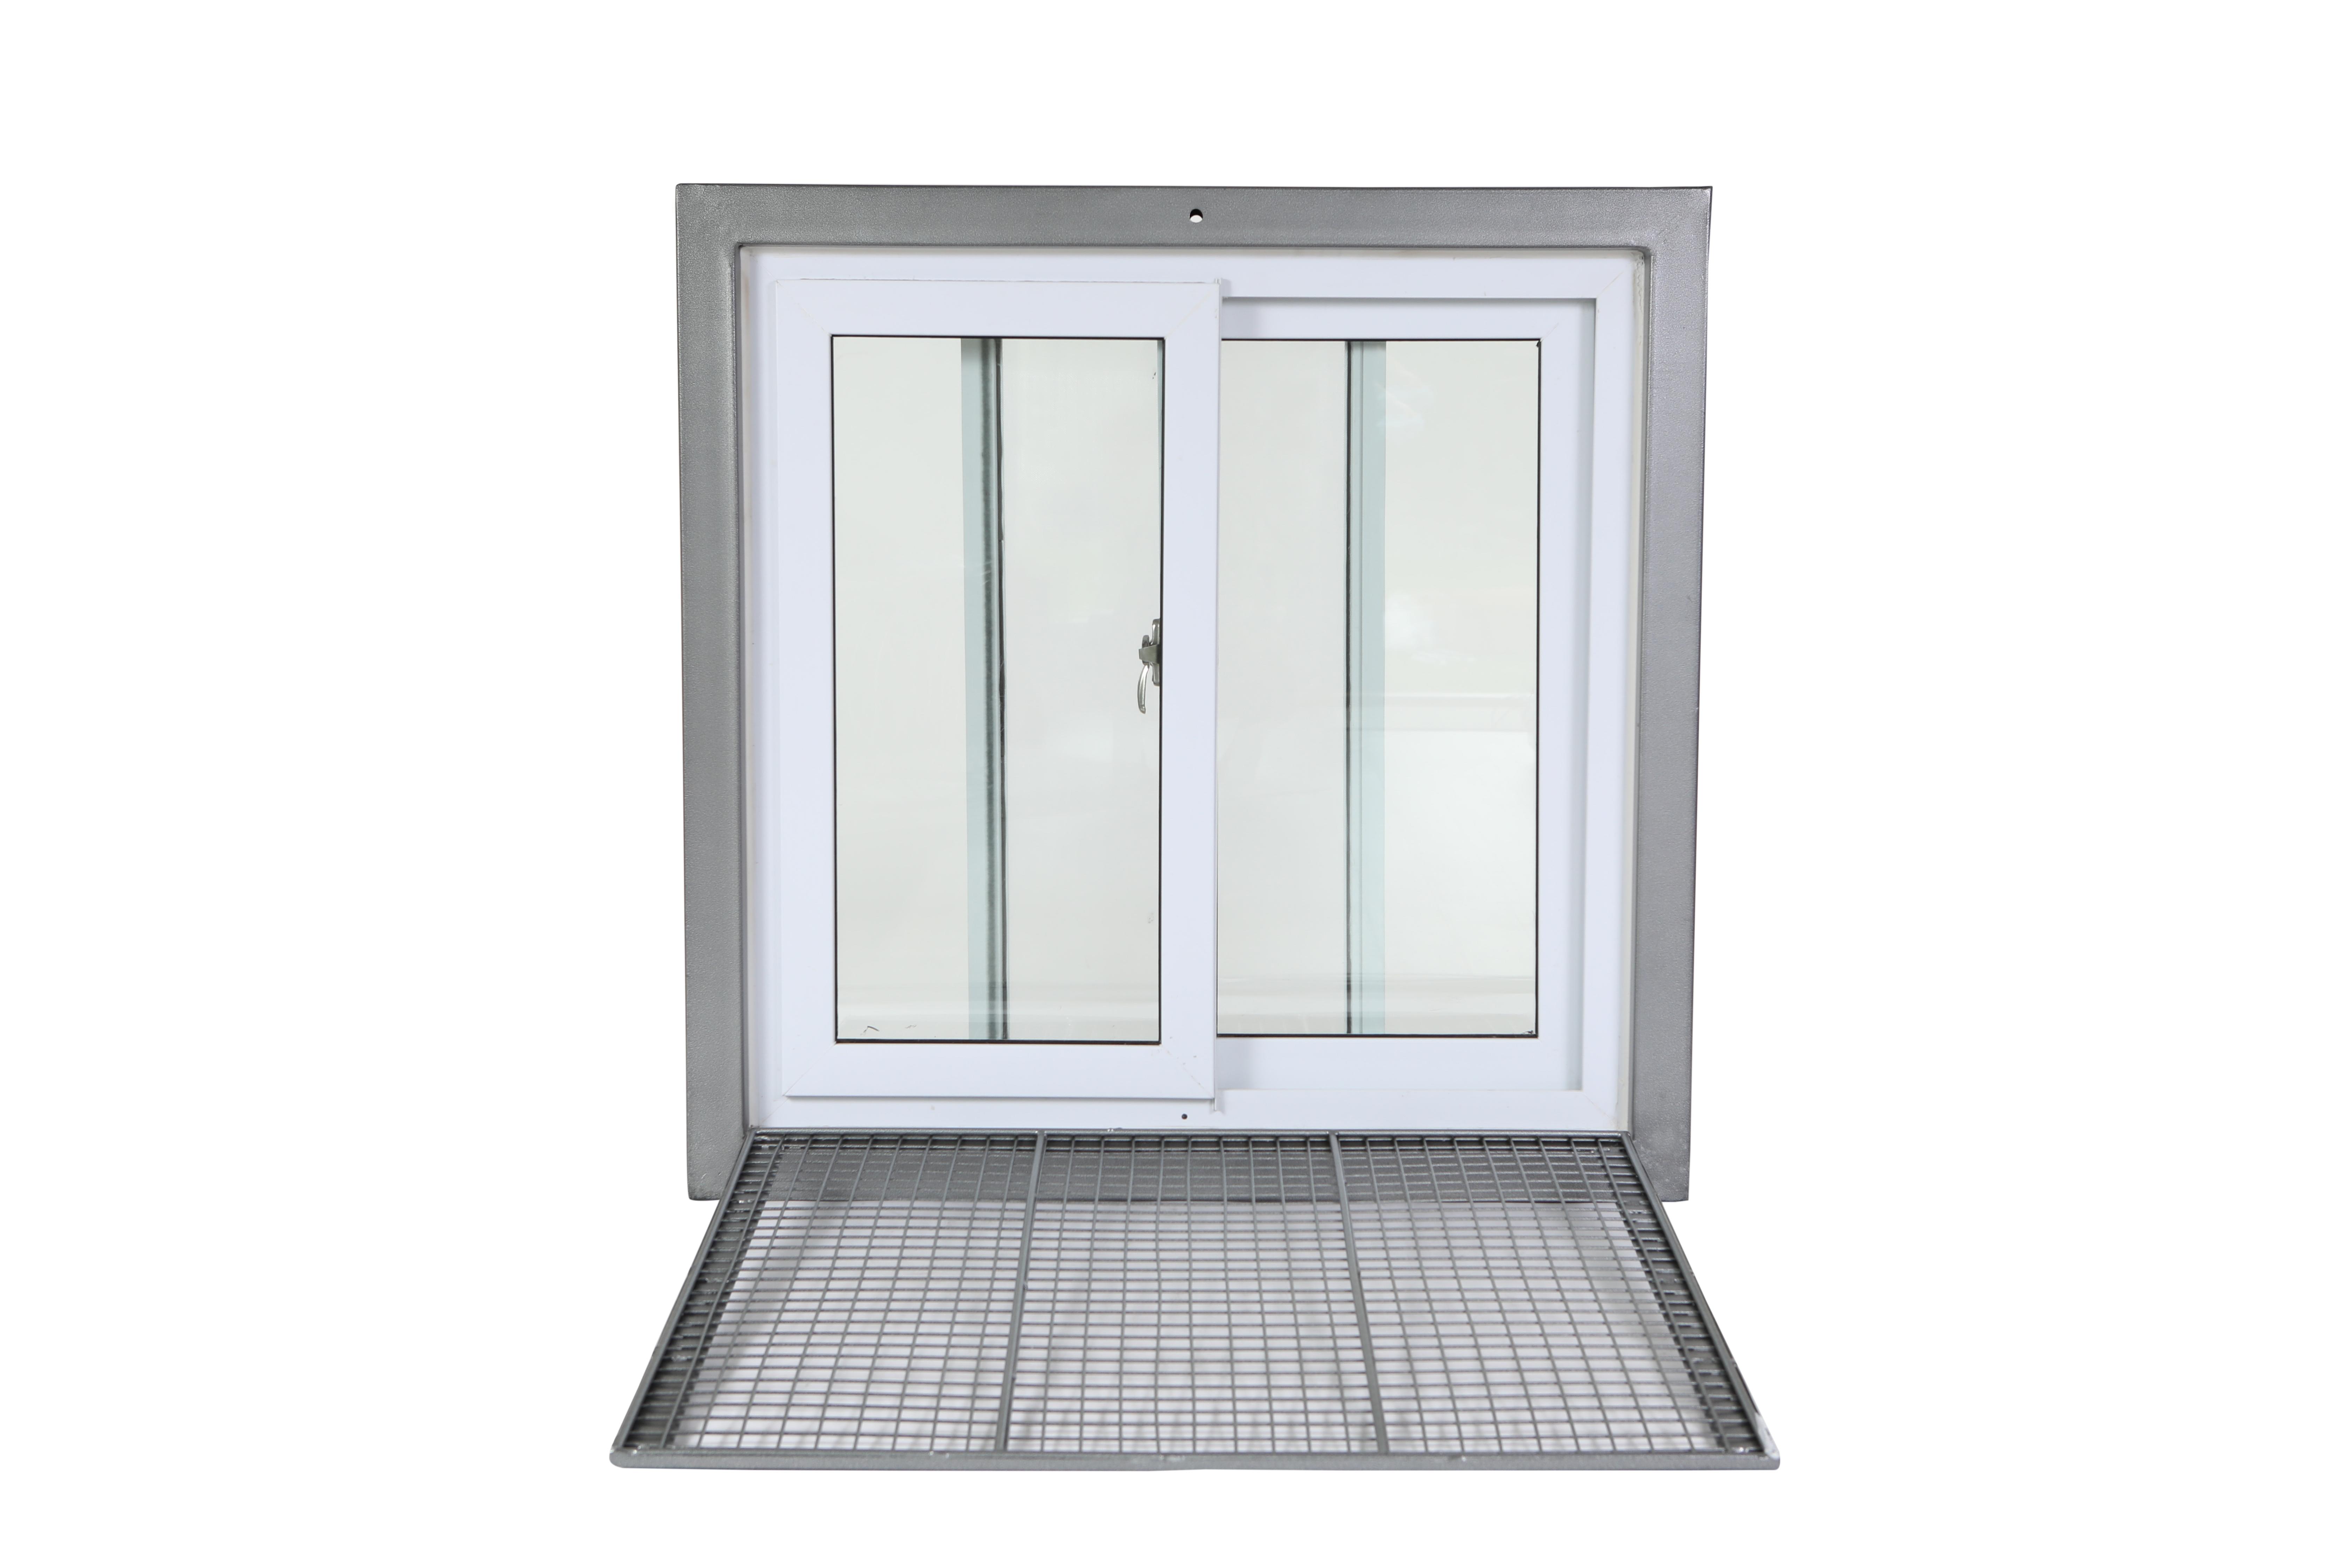 F1e.6066 - 3'x3' INSTA Frame and Window PVC4